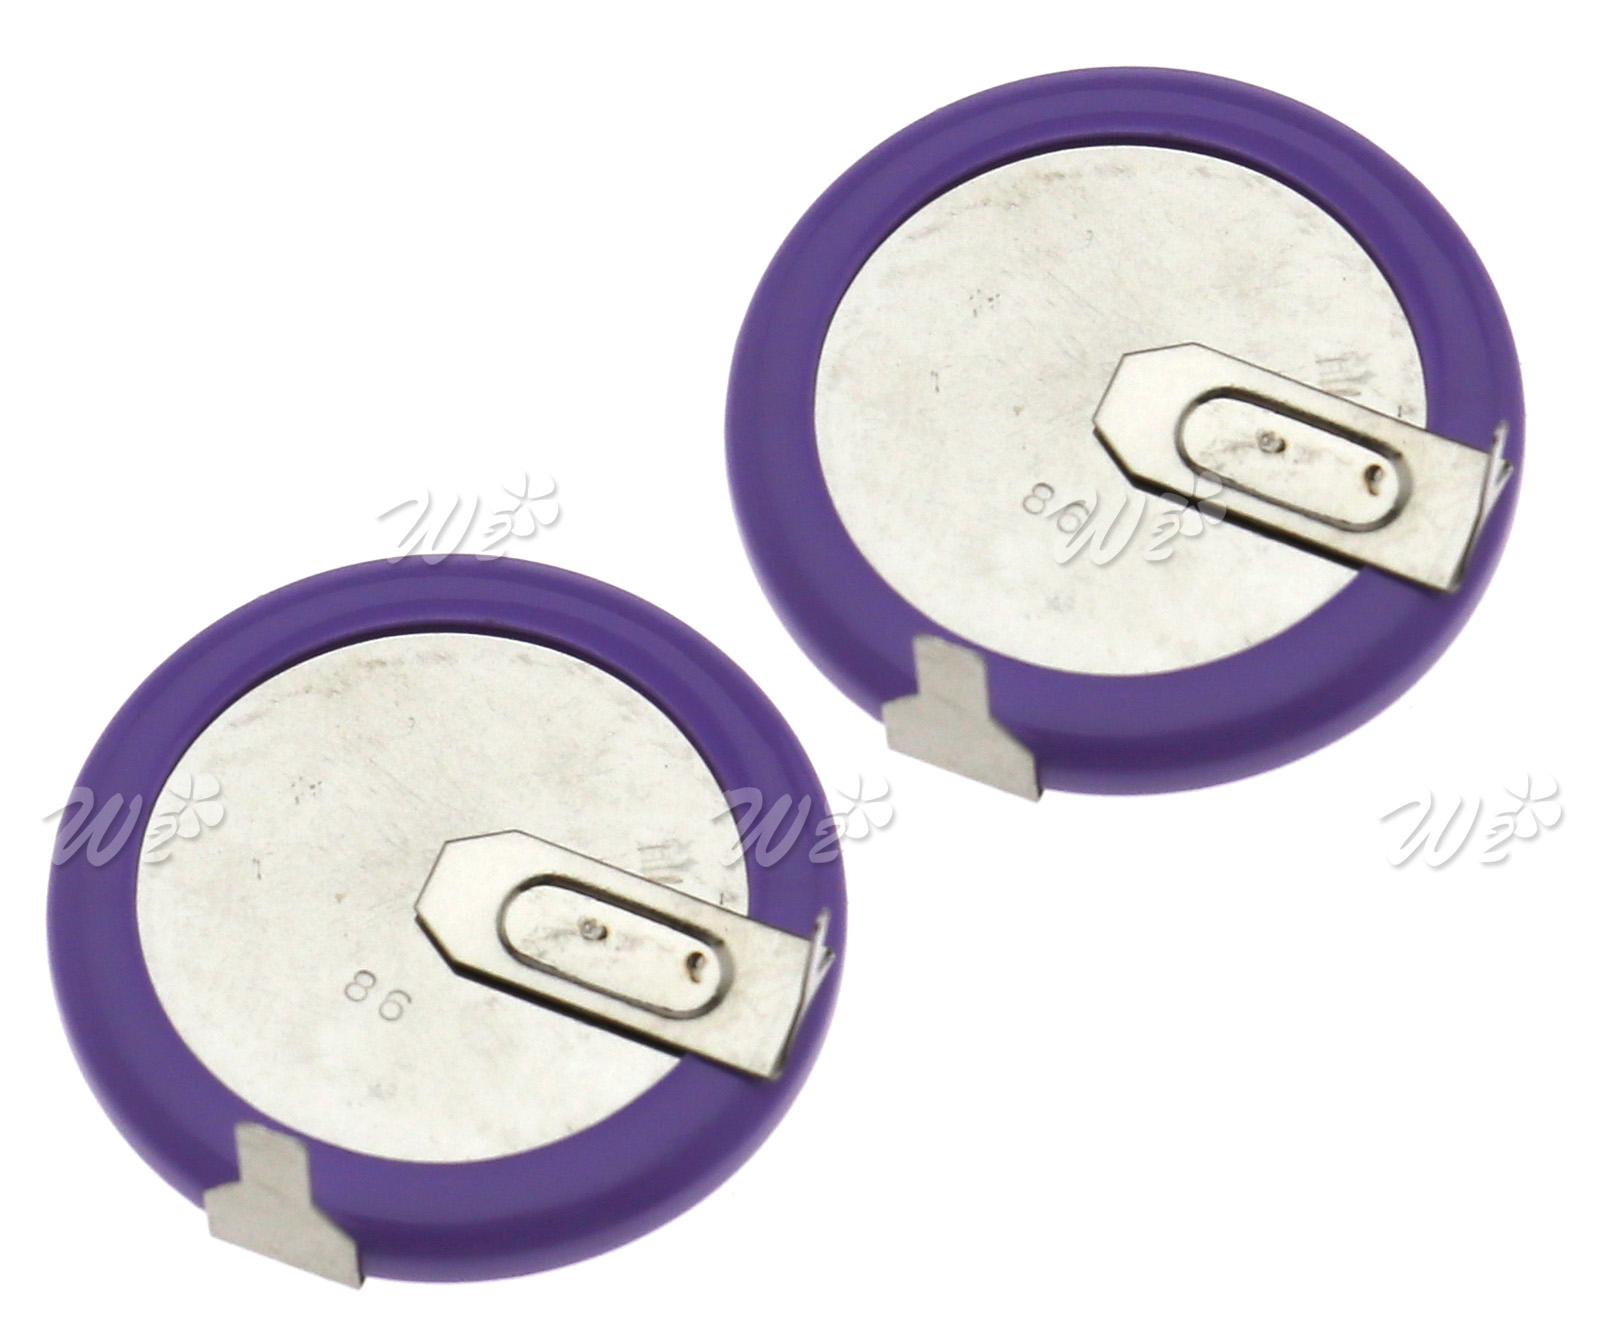 2Pcs ML2020 Mini Battery Replacement For BMW E46 E60 E90 Remote Key